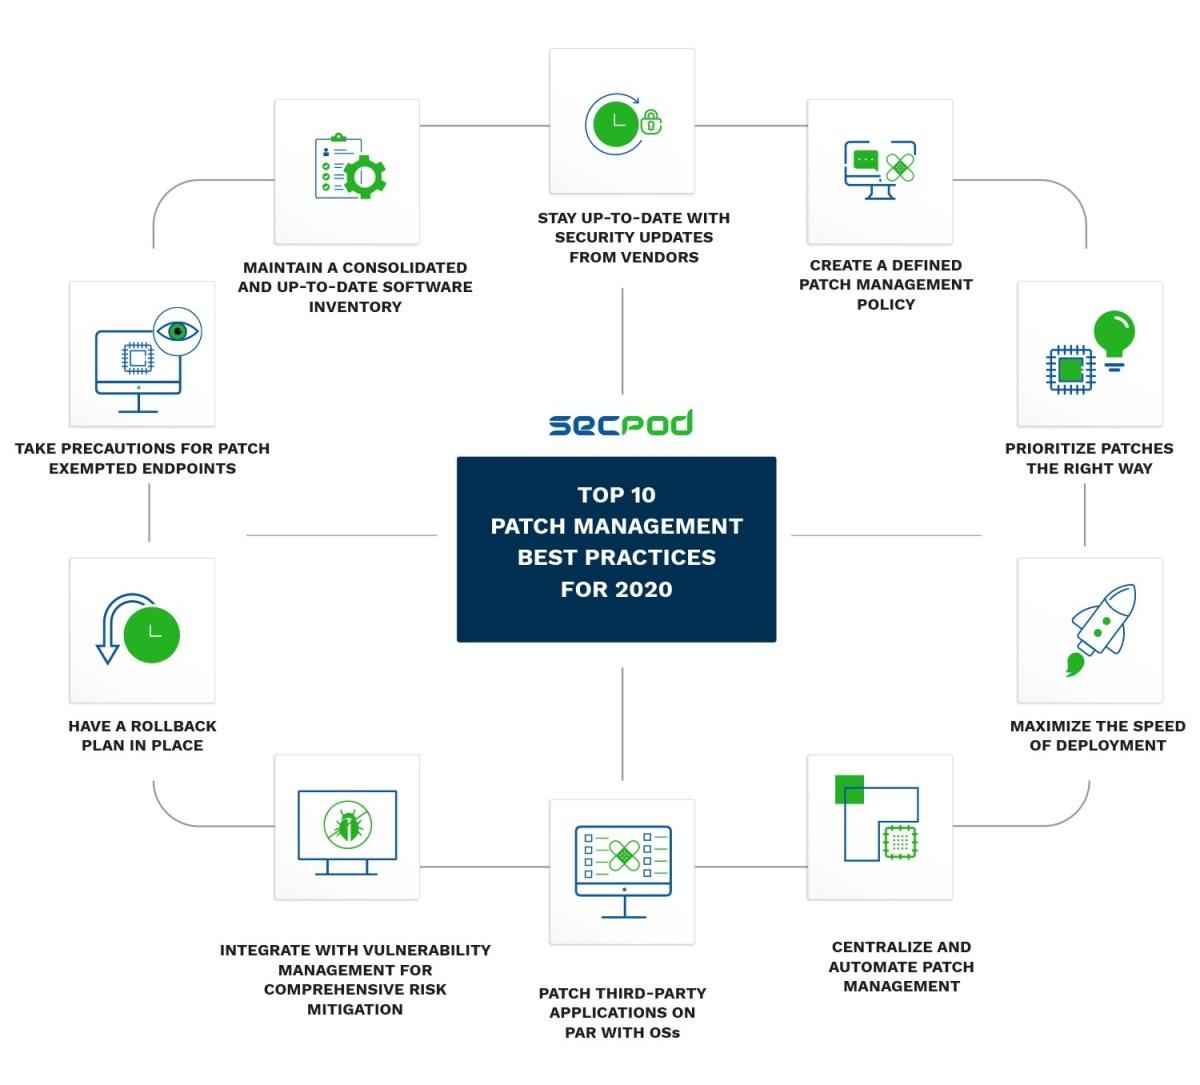 best-practices-of-patch-management-2020